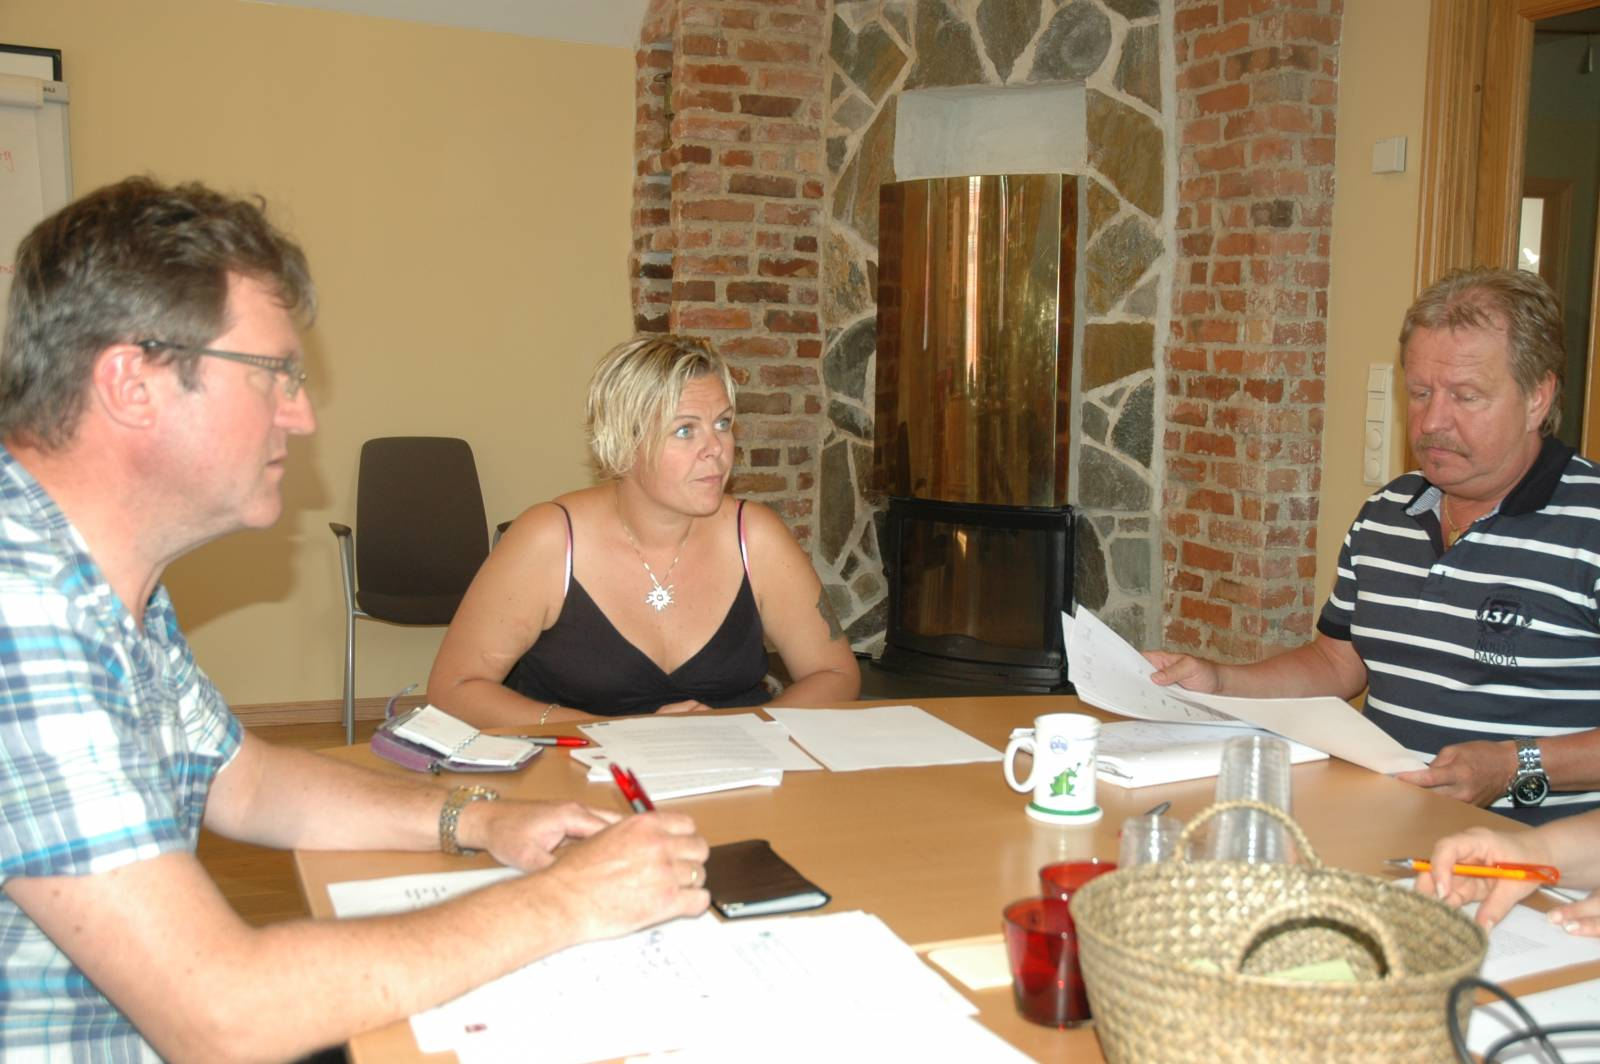 Roy sammen med Roy Erling Furre og Hilde-Marit Rysst etter kongressen i 2011. En ny ledelse i SAFE forbereder arbeidsfordeling og oppgaver framover. Foto: Mette Møllerop